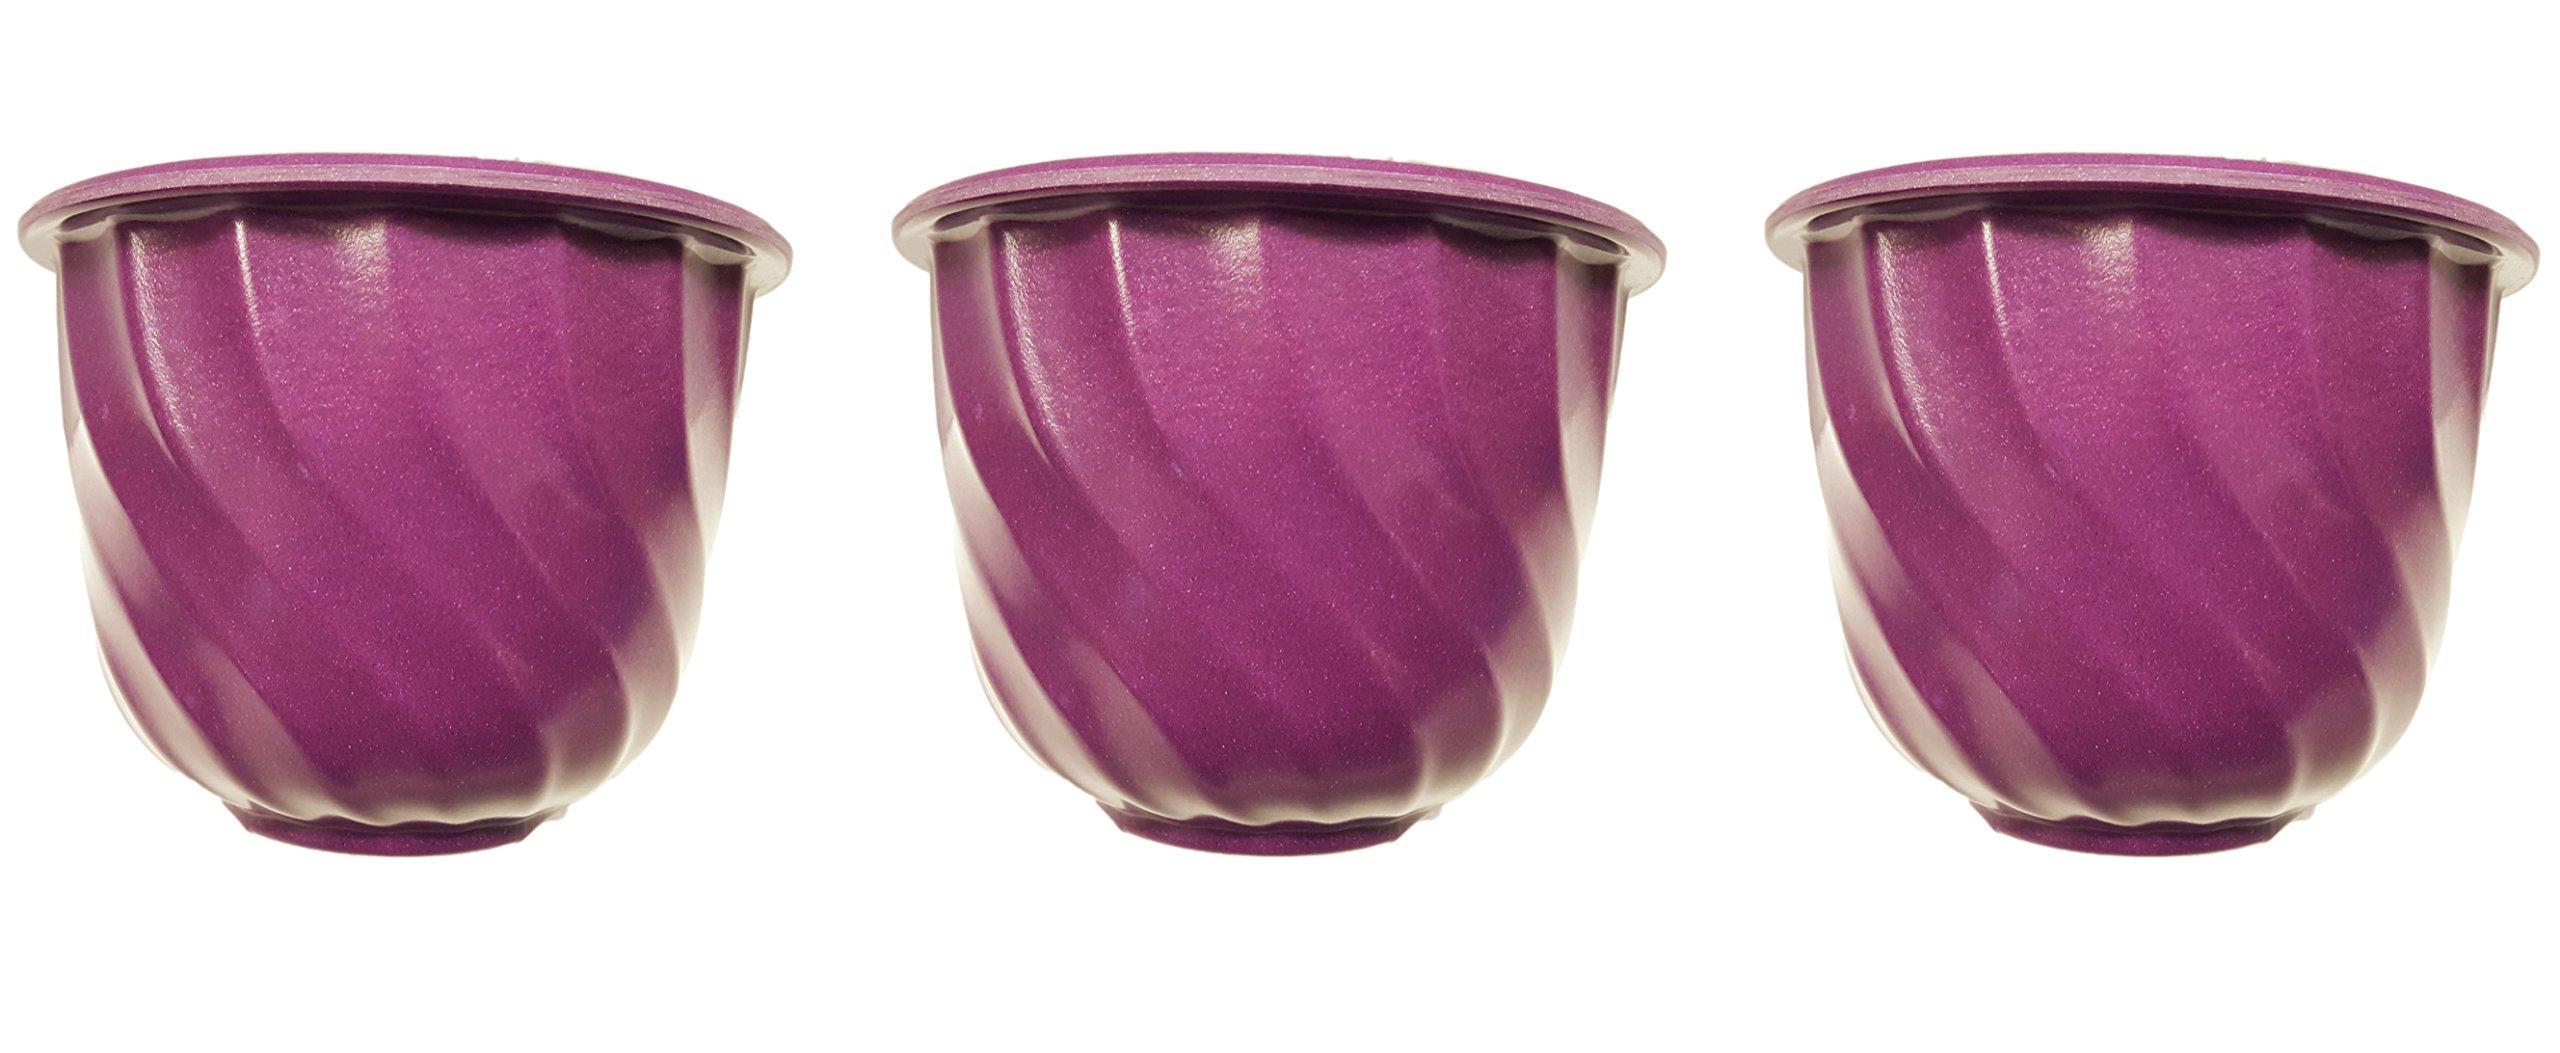 "Set of 3 Purple Round Swirl 6.75'' x 5"" Biodegradable Bamboo Fiber Planters (Purple)"